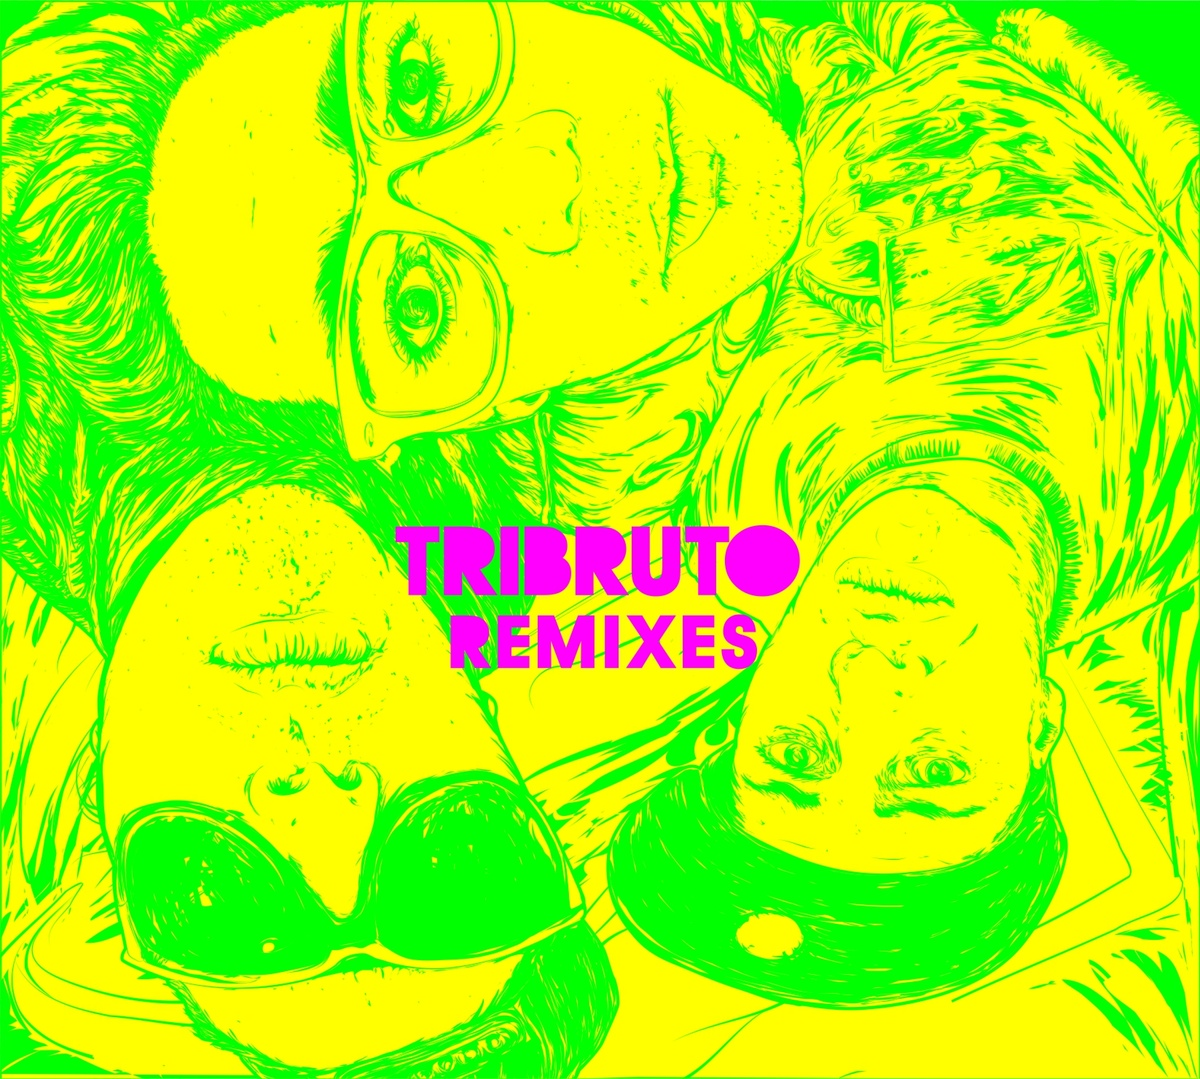 Tribruto - REMIXES